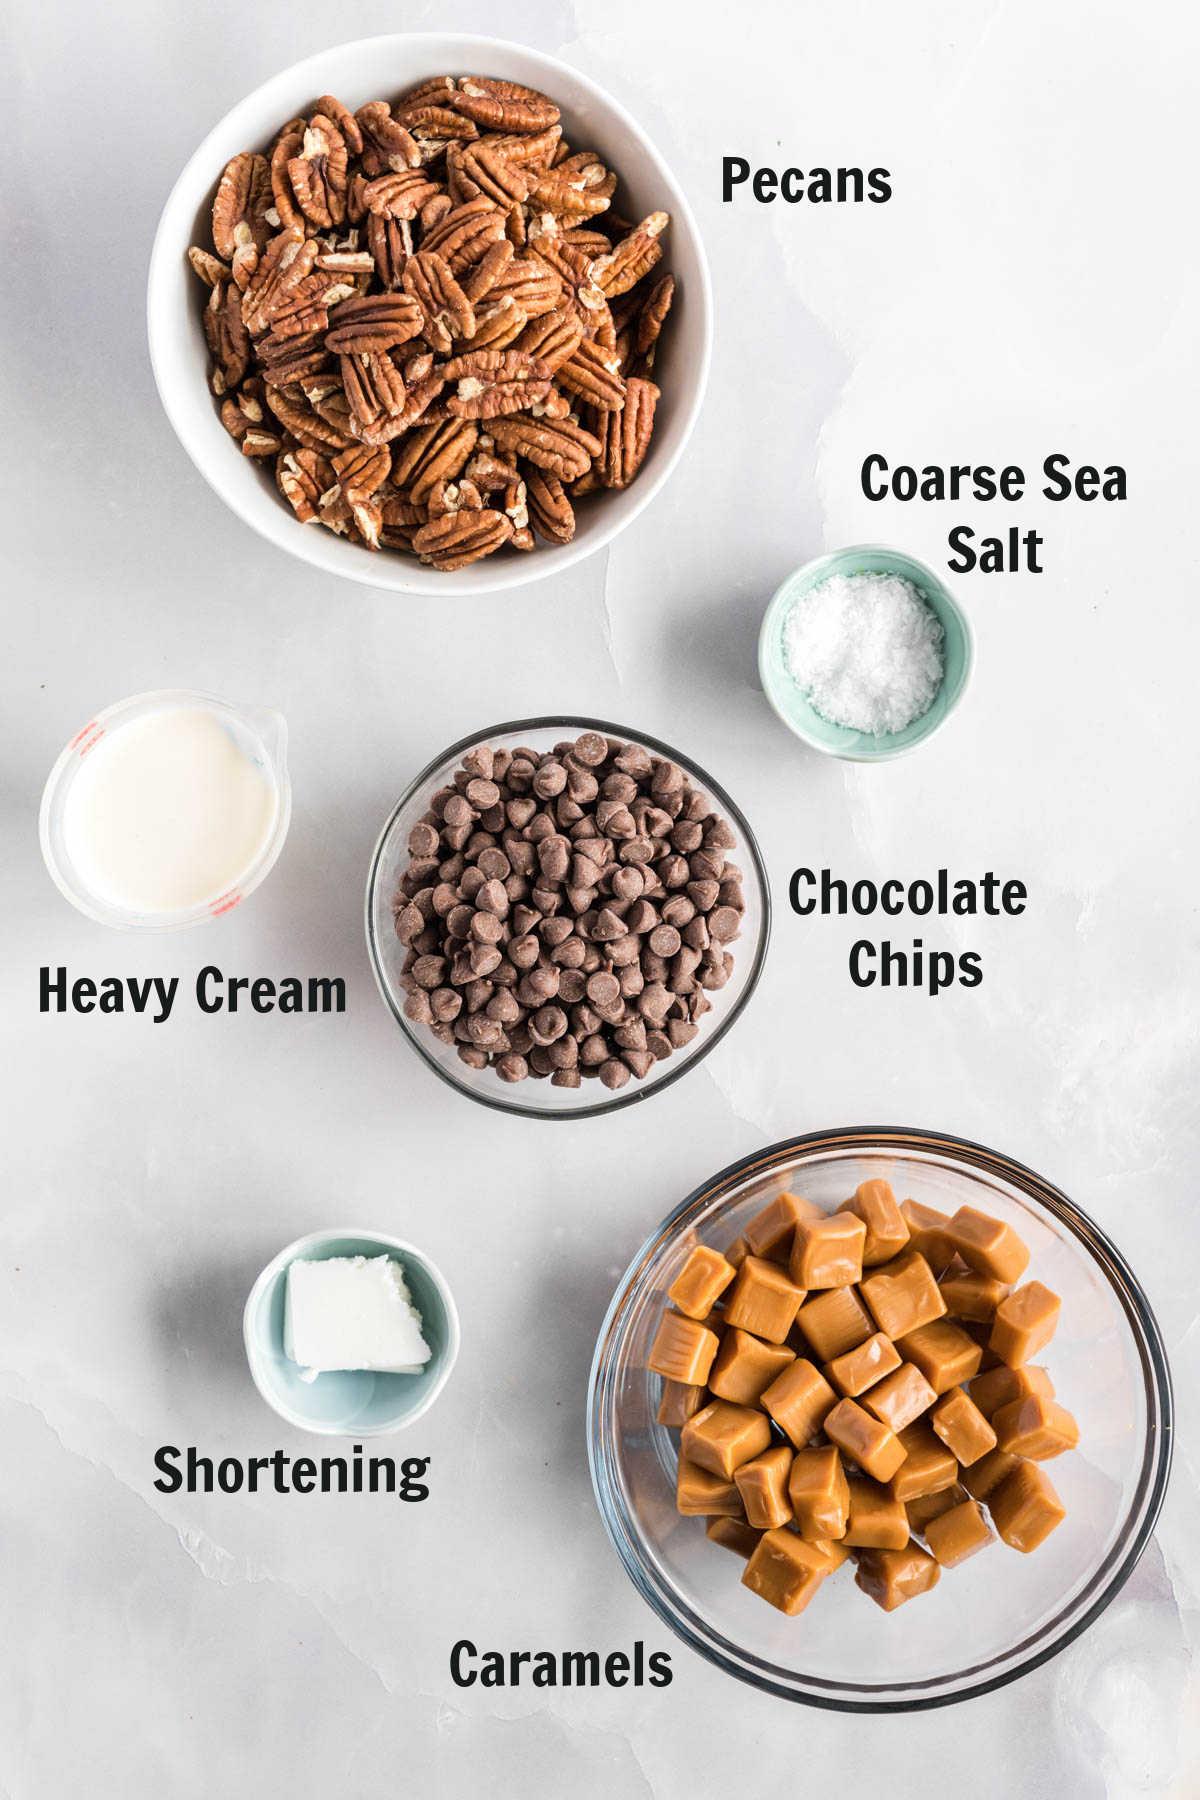 Ingredients to make pecan turtle clusters.